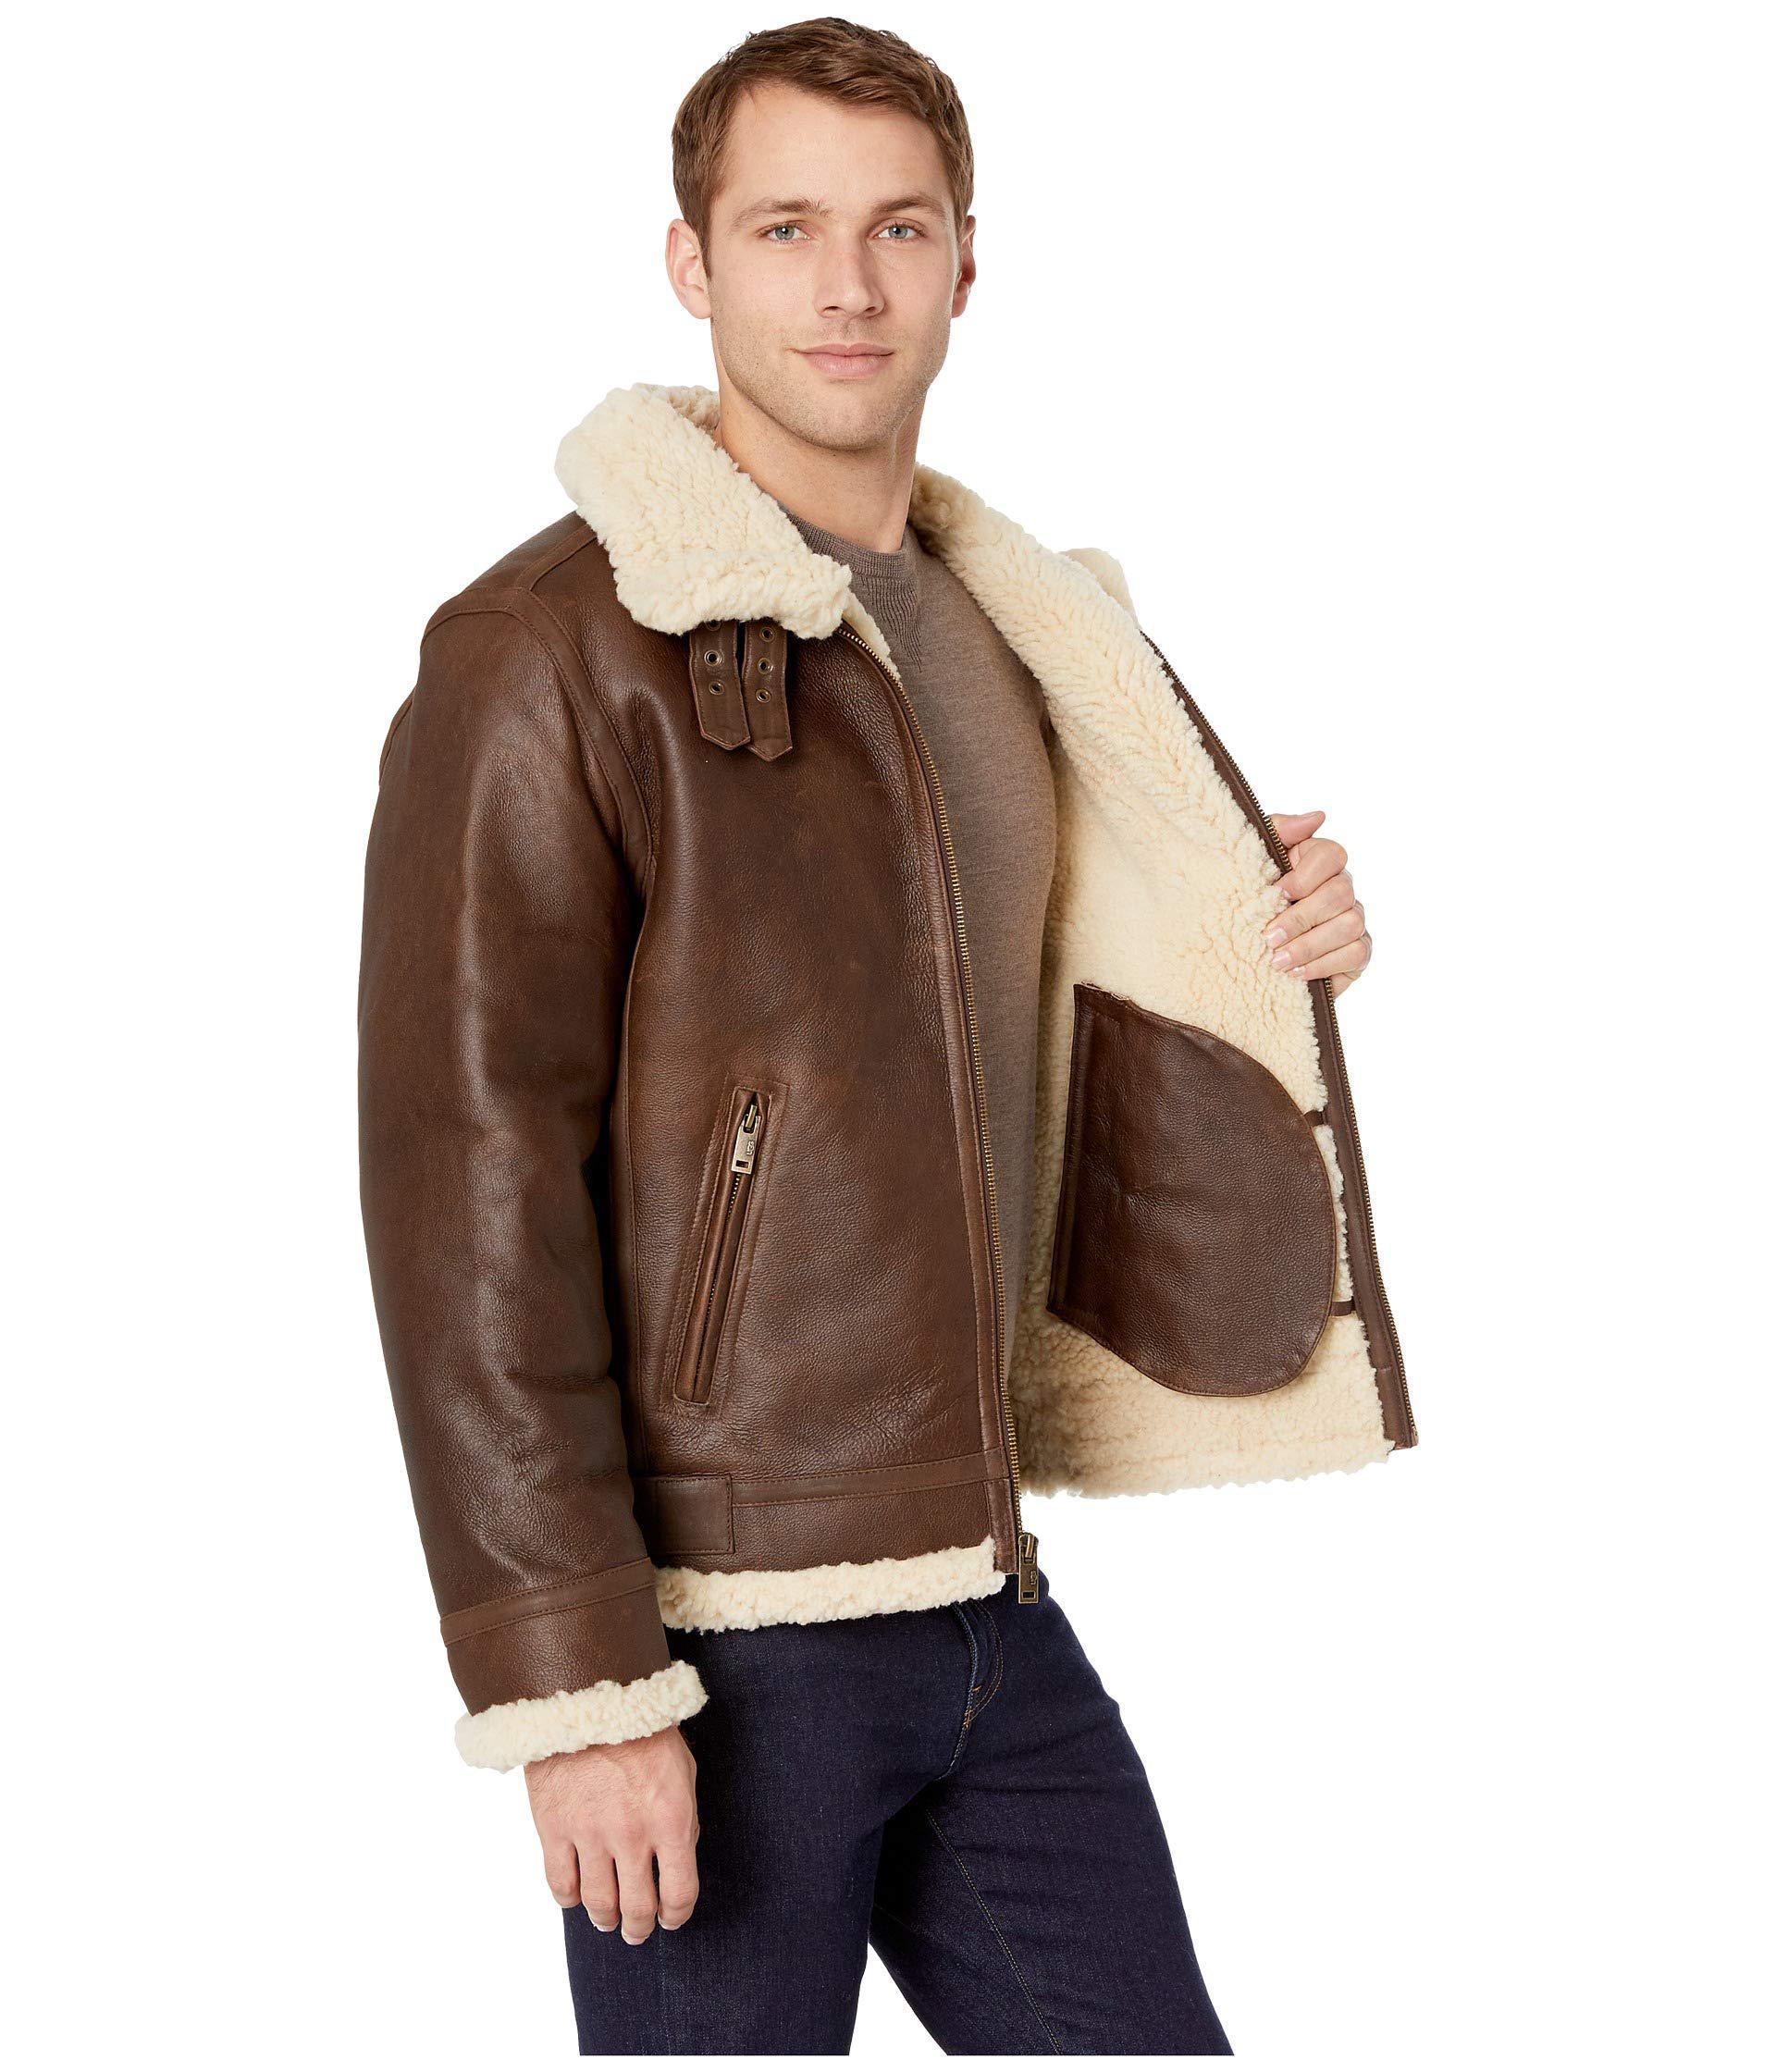 Lyst ugg auden shearling aviator jacket chestnut mens coat jpg 1920x2240 Uggs  chestnut coat e988e4687